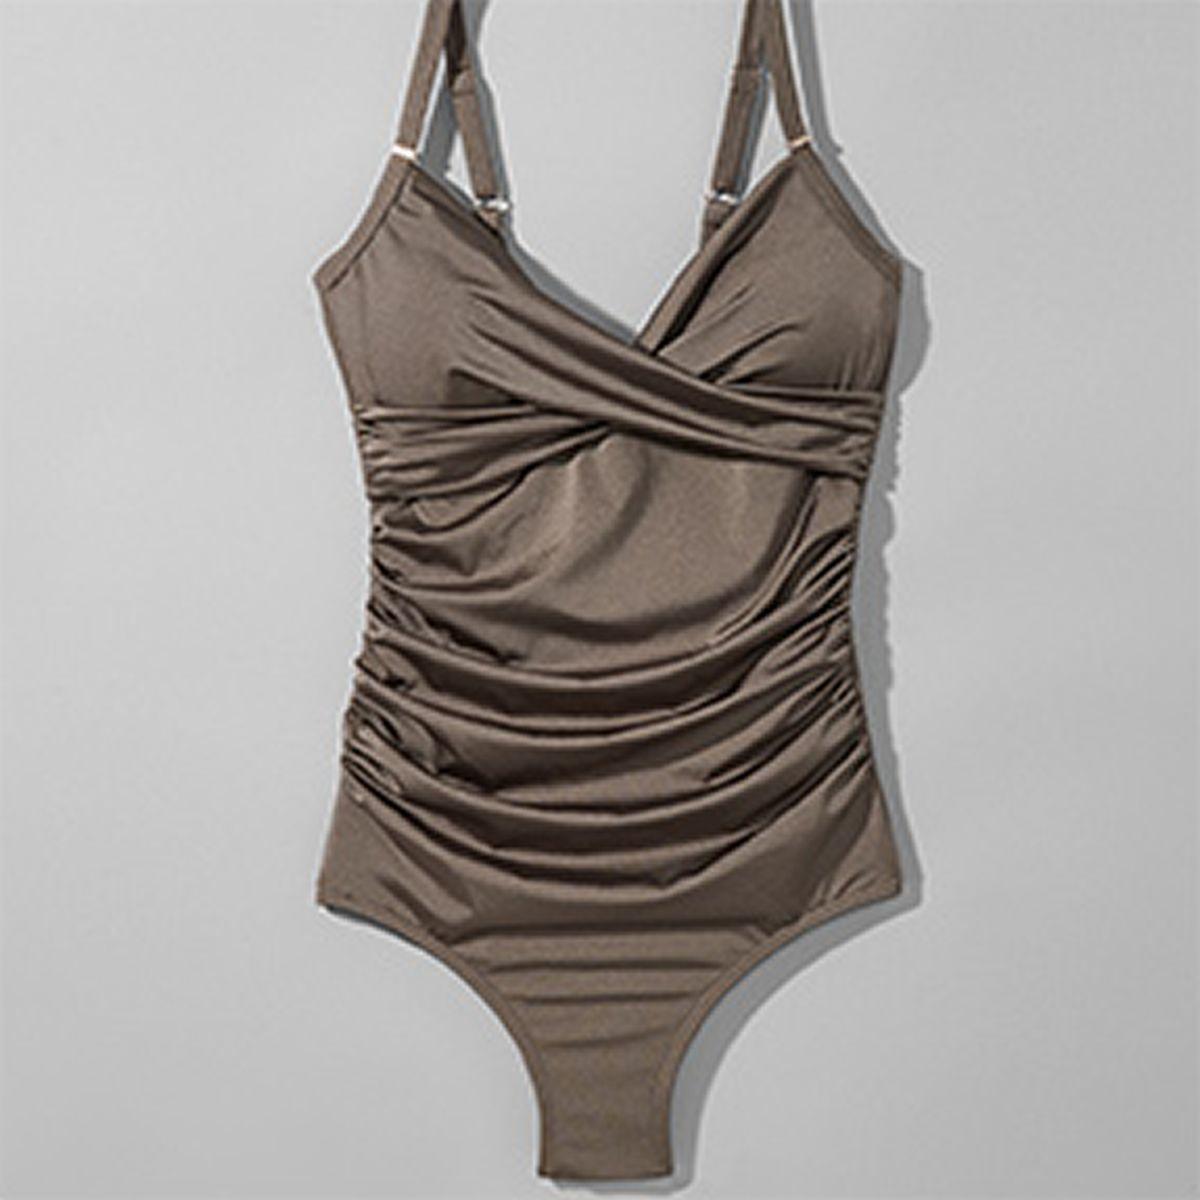 78dfbe8685 Petite Clothing - Petite Women s Clothing   Fashion - Macy s